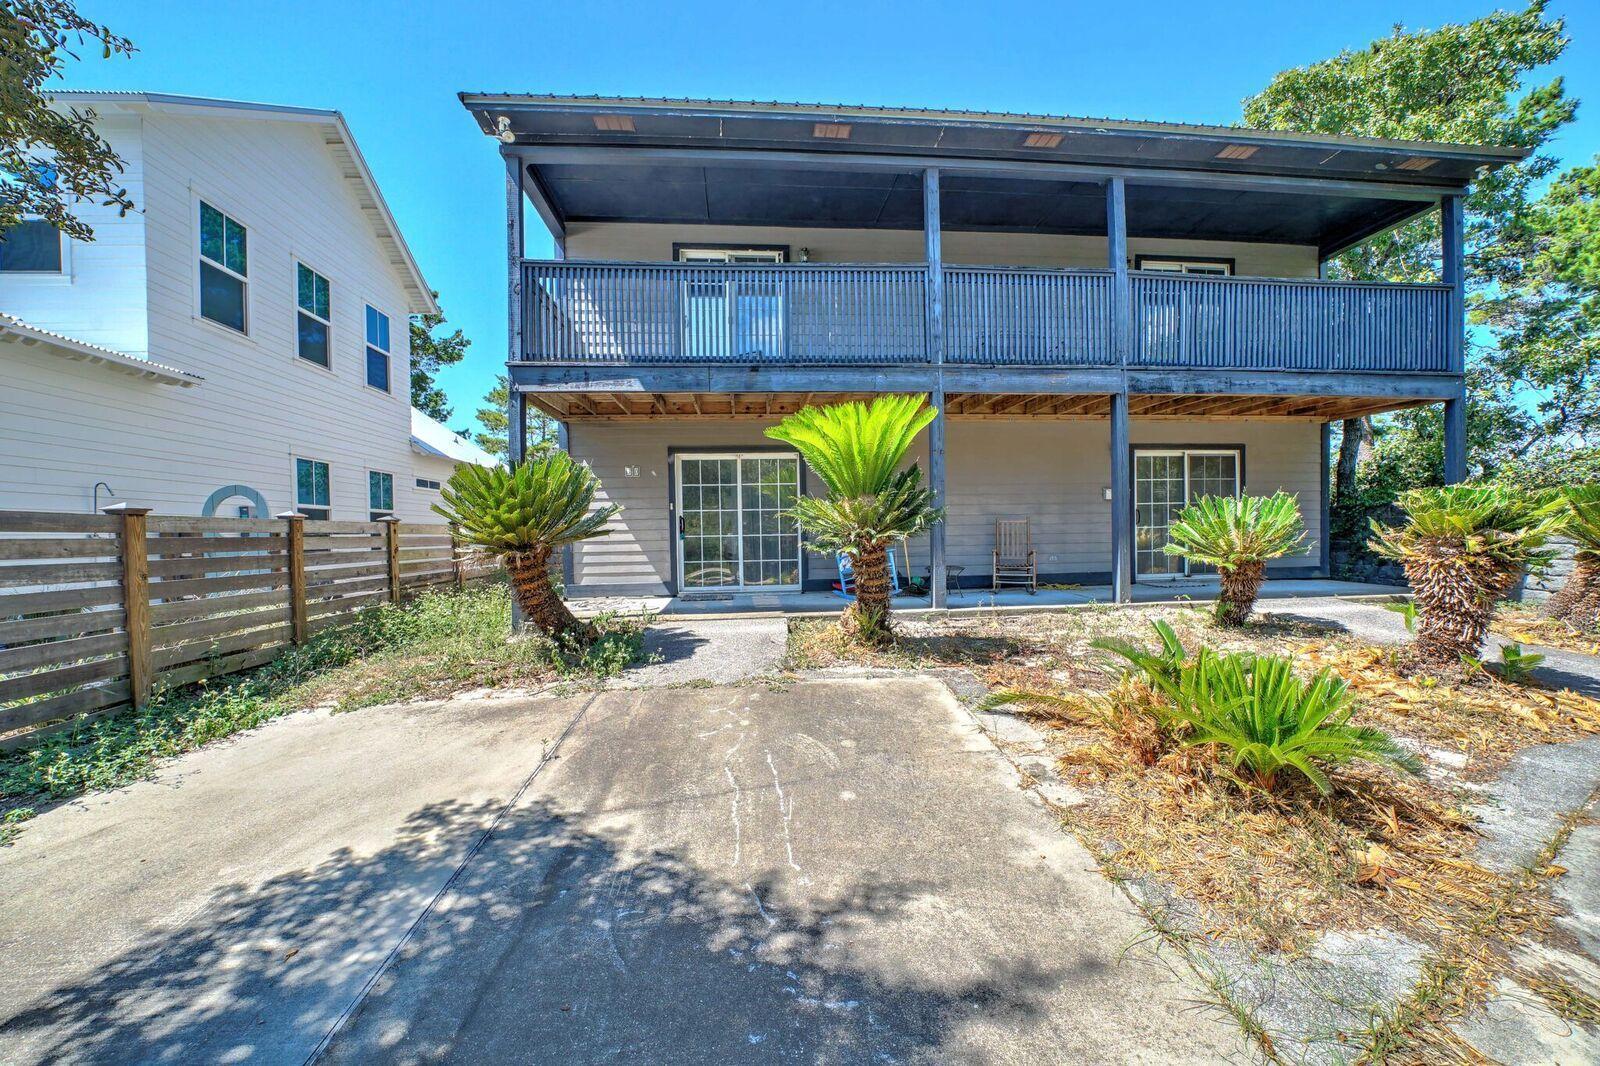 Photo of home for sale at 30 Gulf, Santa Rosa Beach FL